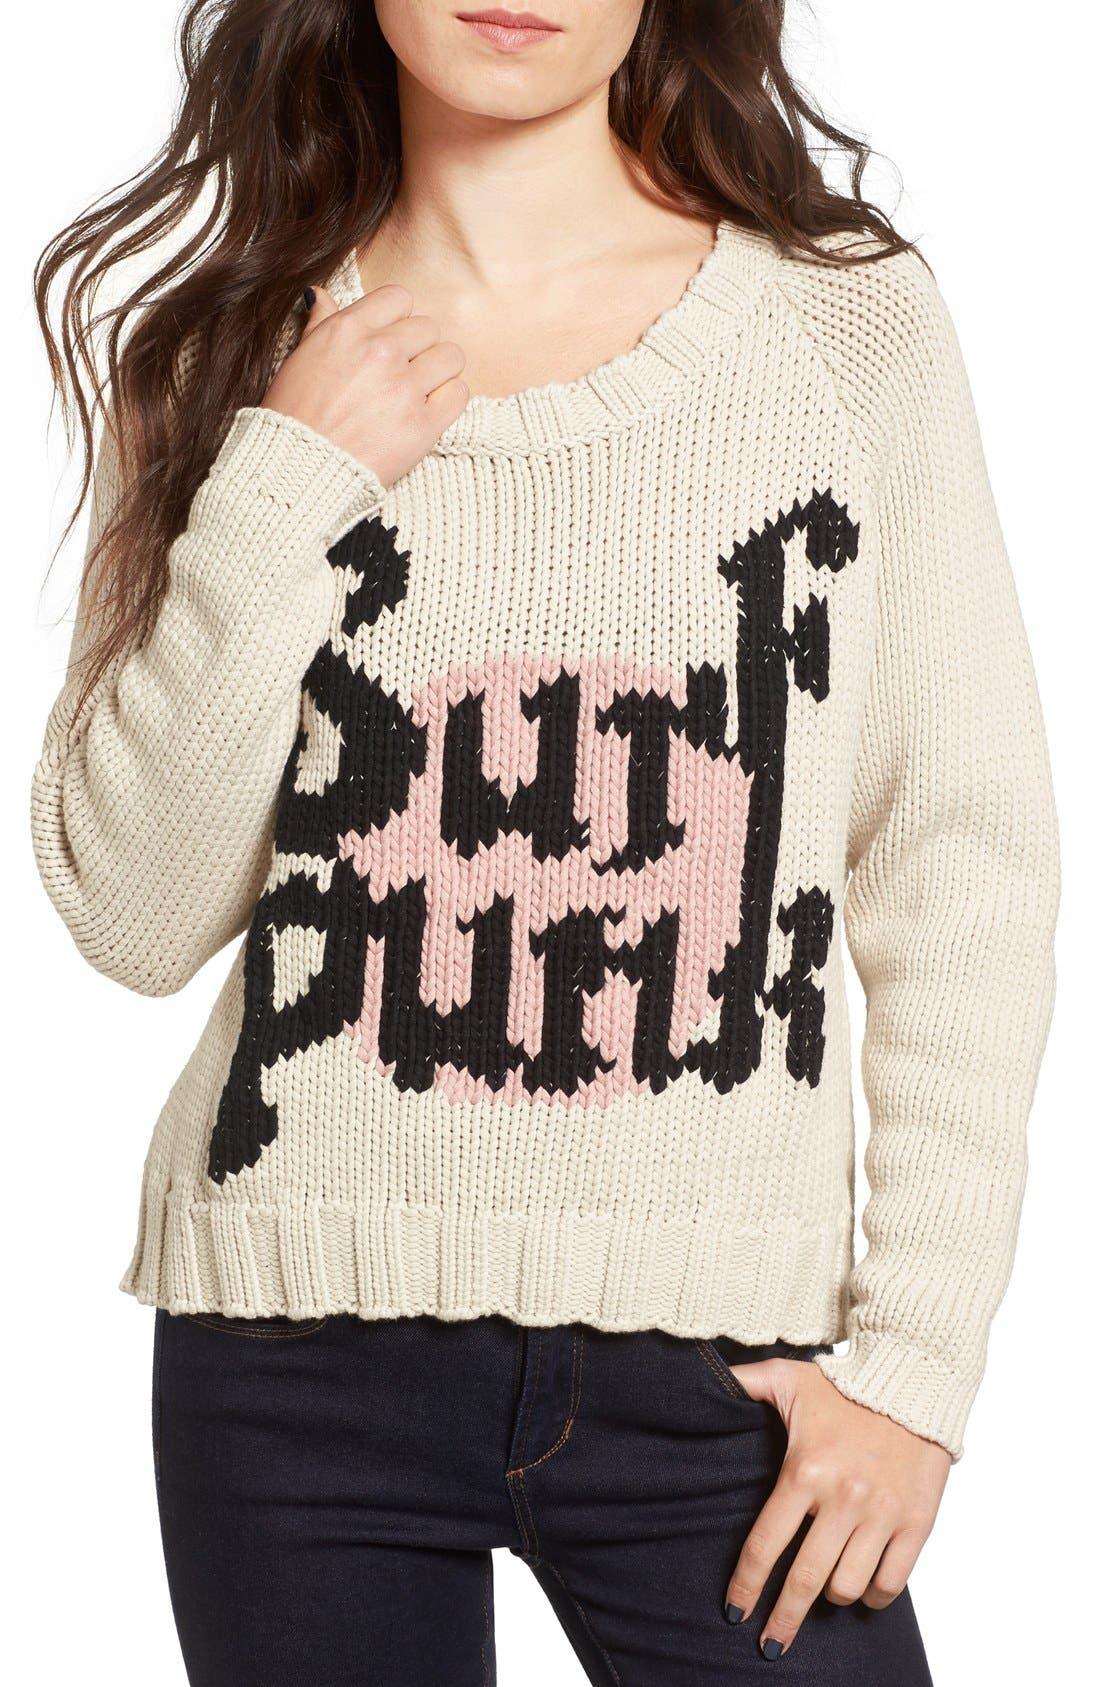 Alternate Image 1 Selected - One Teaspoon Surf Punk Intarsia Knit Sweater